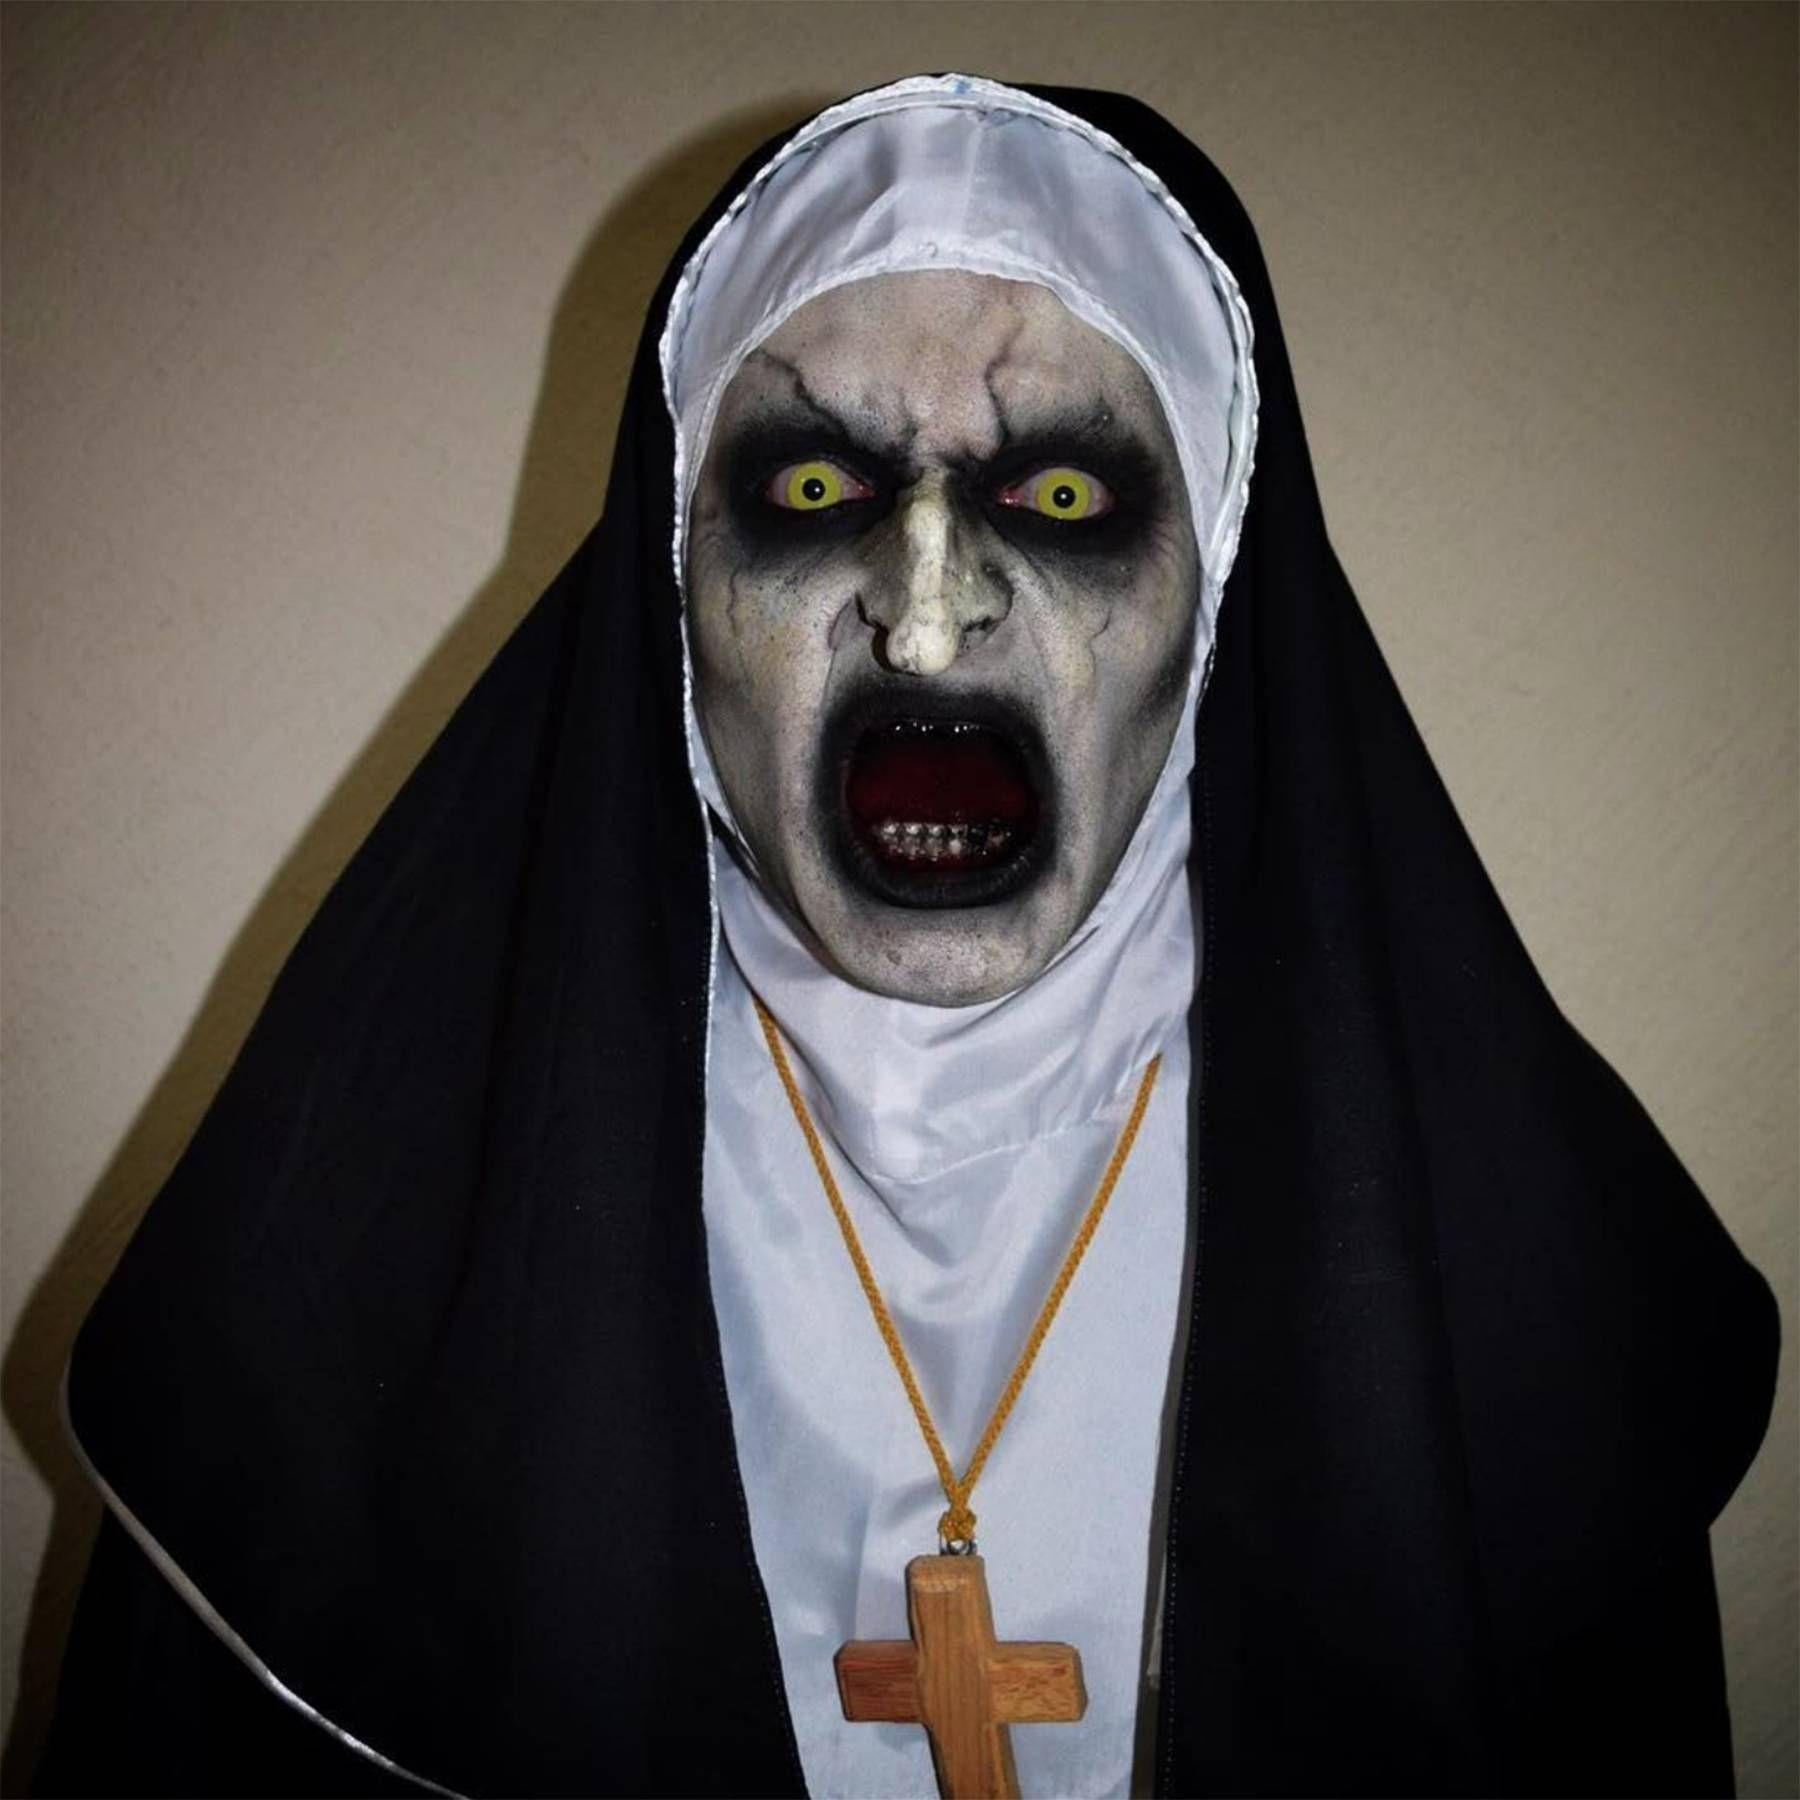 The Nun Vs Halloween 2020 The creepiest Halloween makeup looks of 2020 (including a